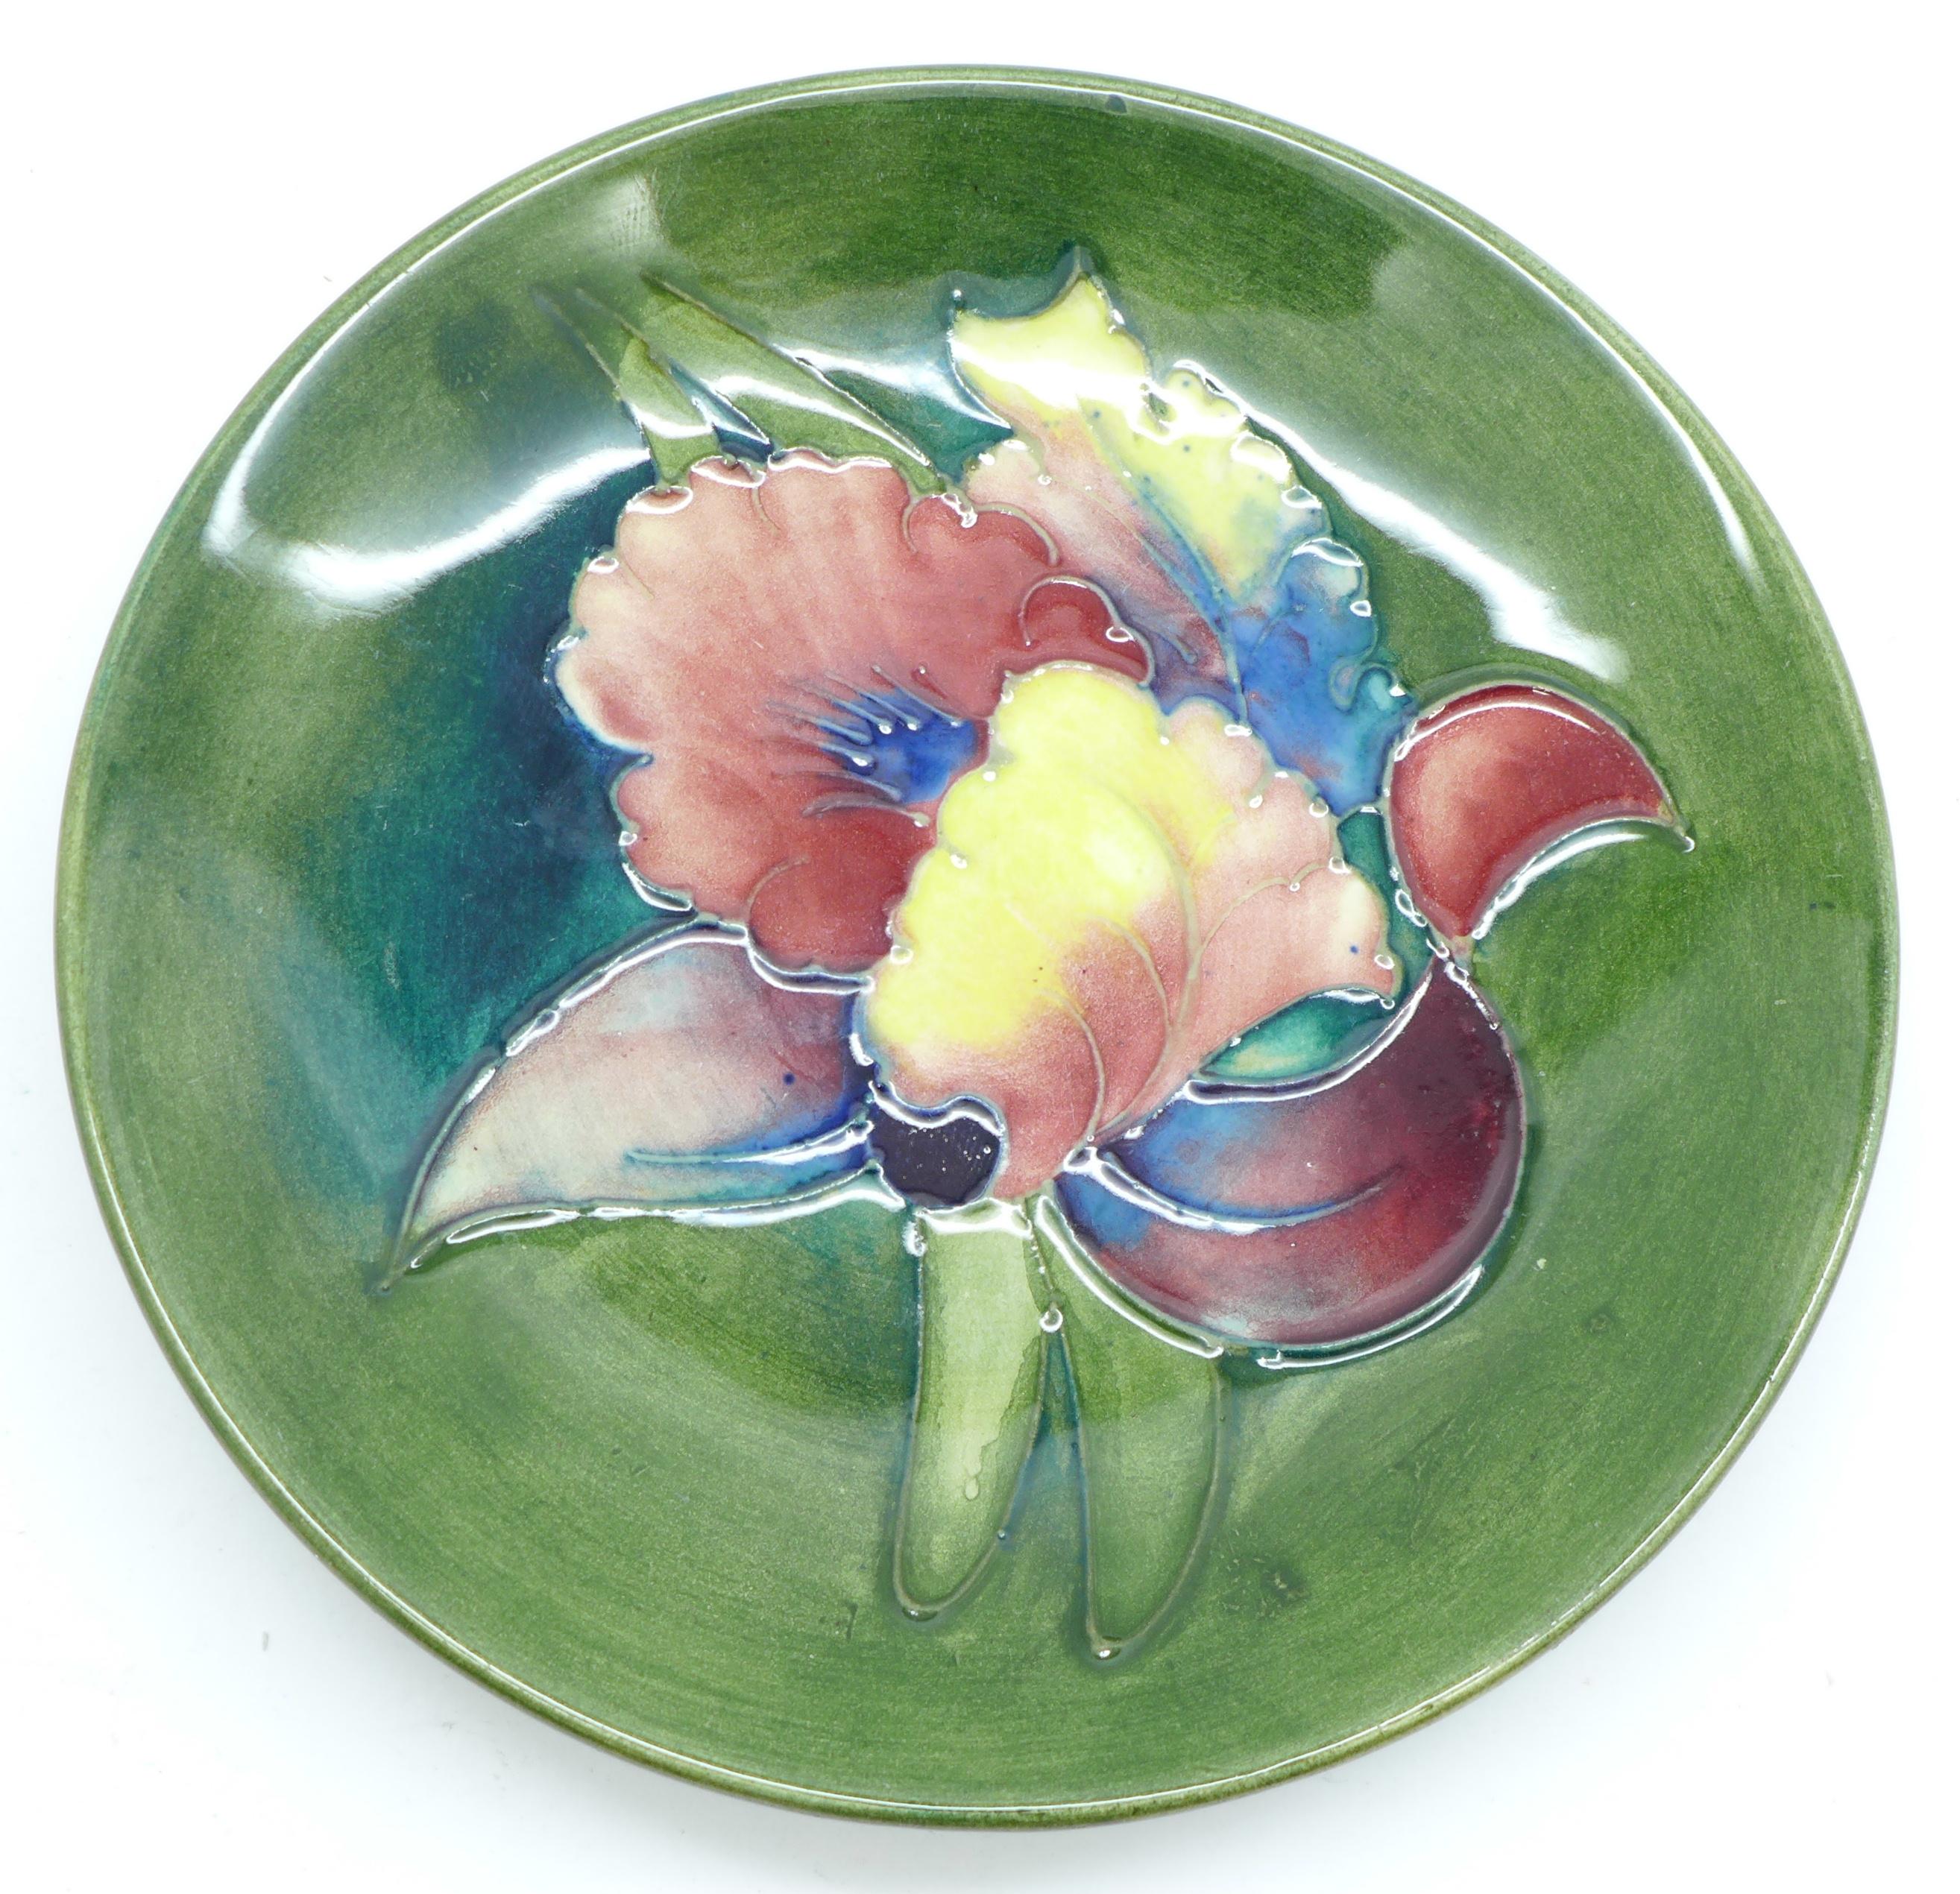 A Moorcroft dish, 11.5cm diameter - Image 2 of 4